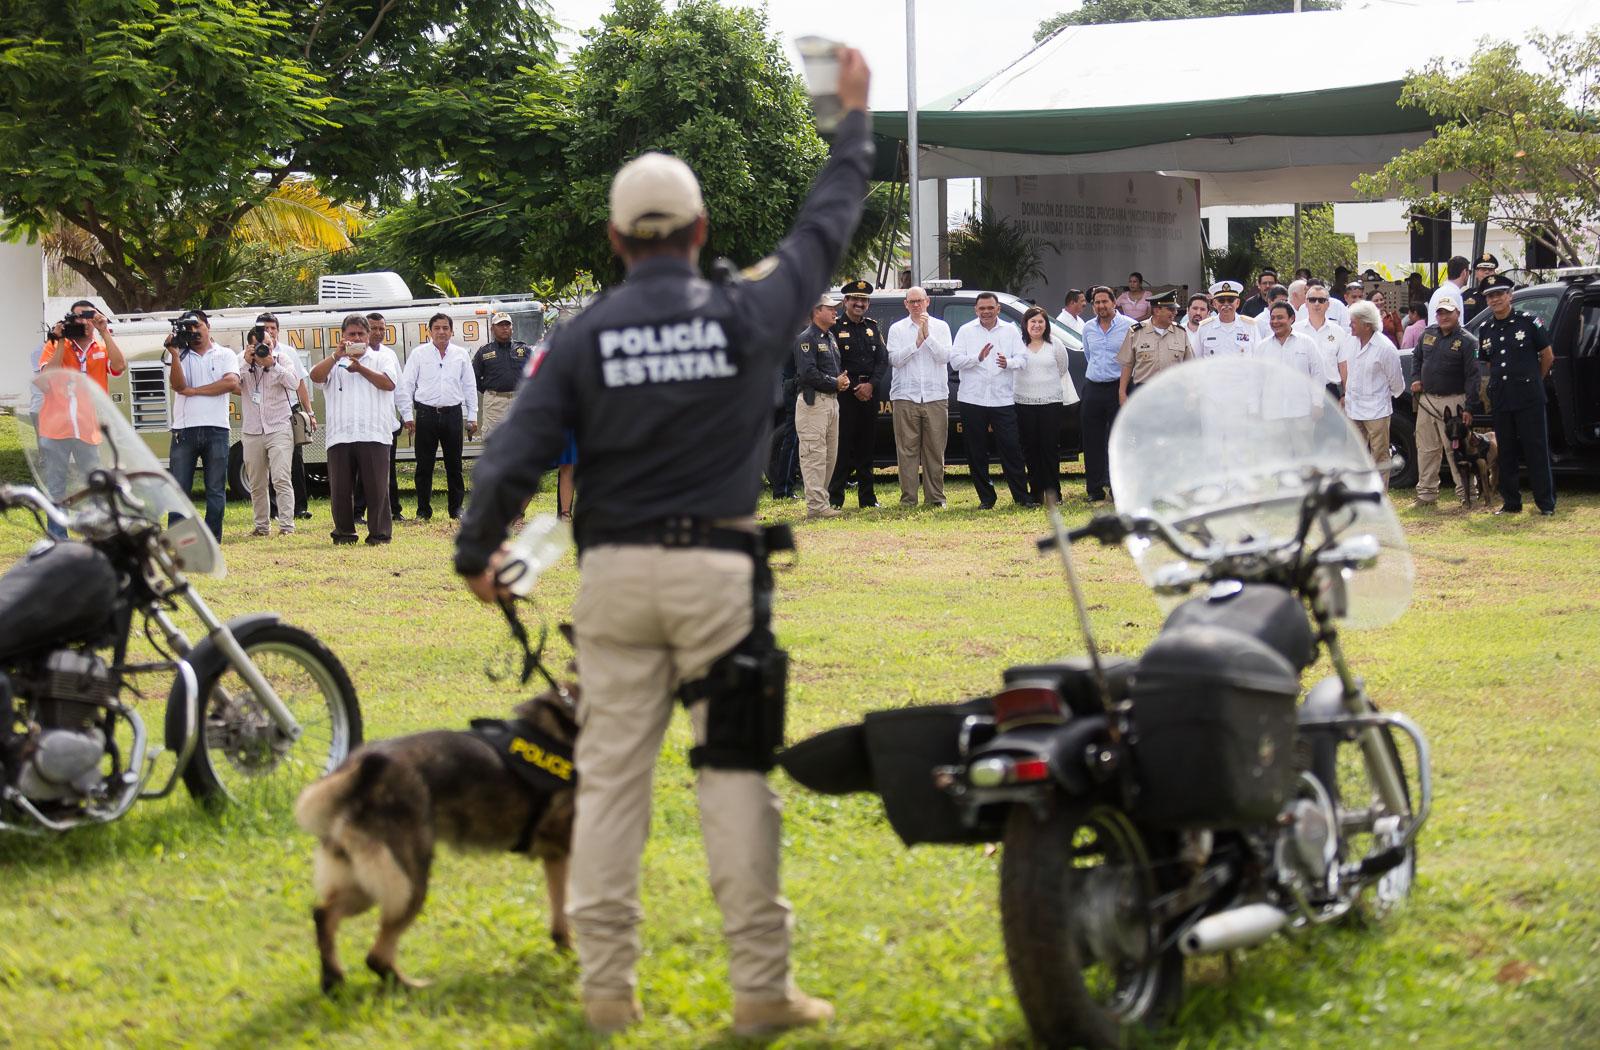 Agentes caninos donados por EU llegan a Policía de Yucatán